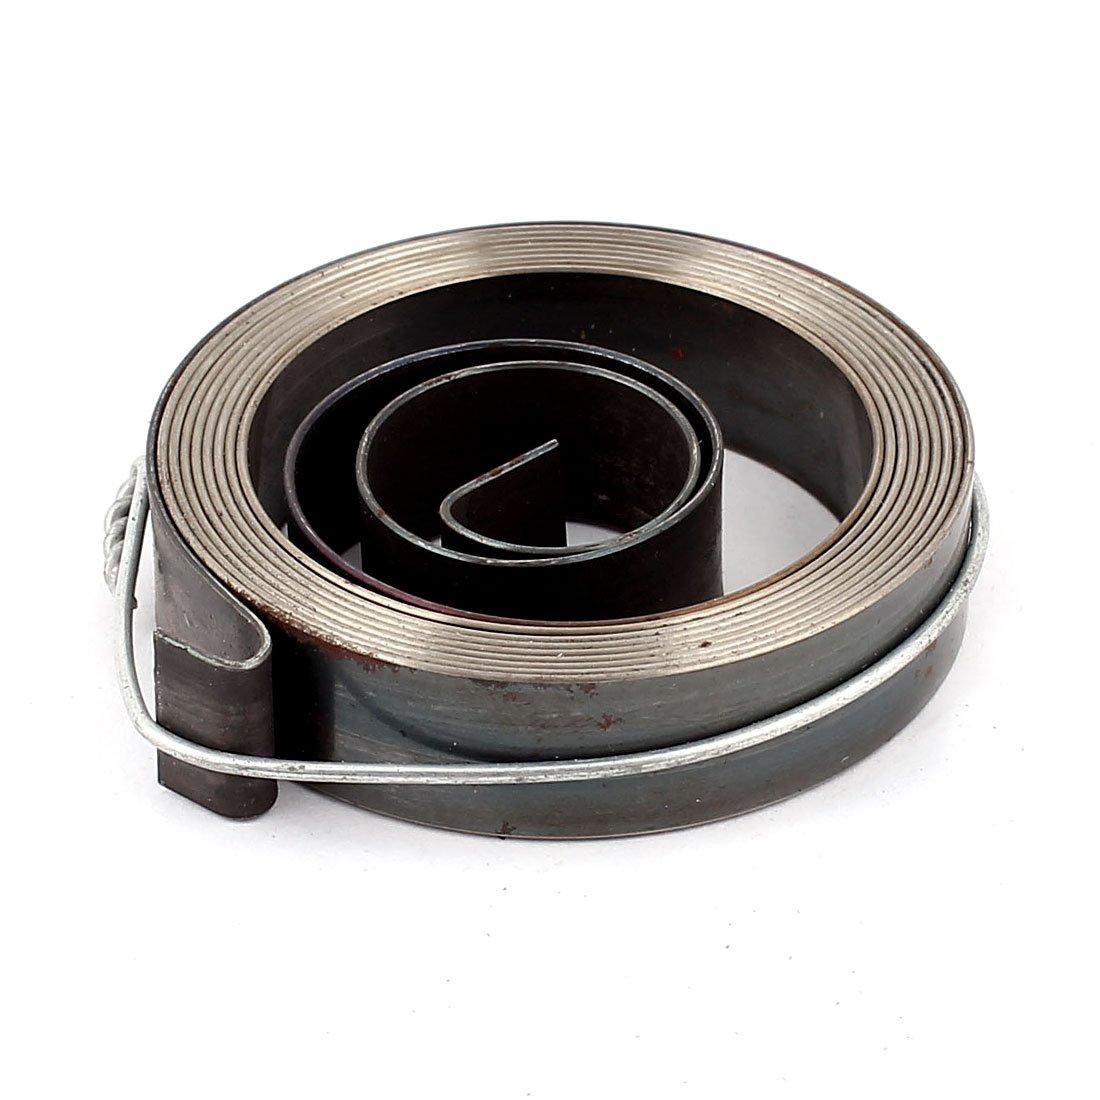 sourcingmap® 12mm x 0.7mm 1540mm Foret presse Bobine nourrir Retour ressort Assemblage a15051200ux0233